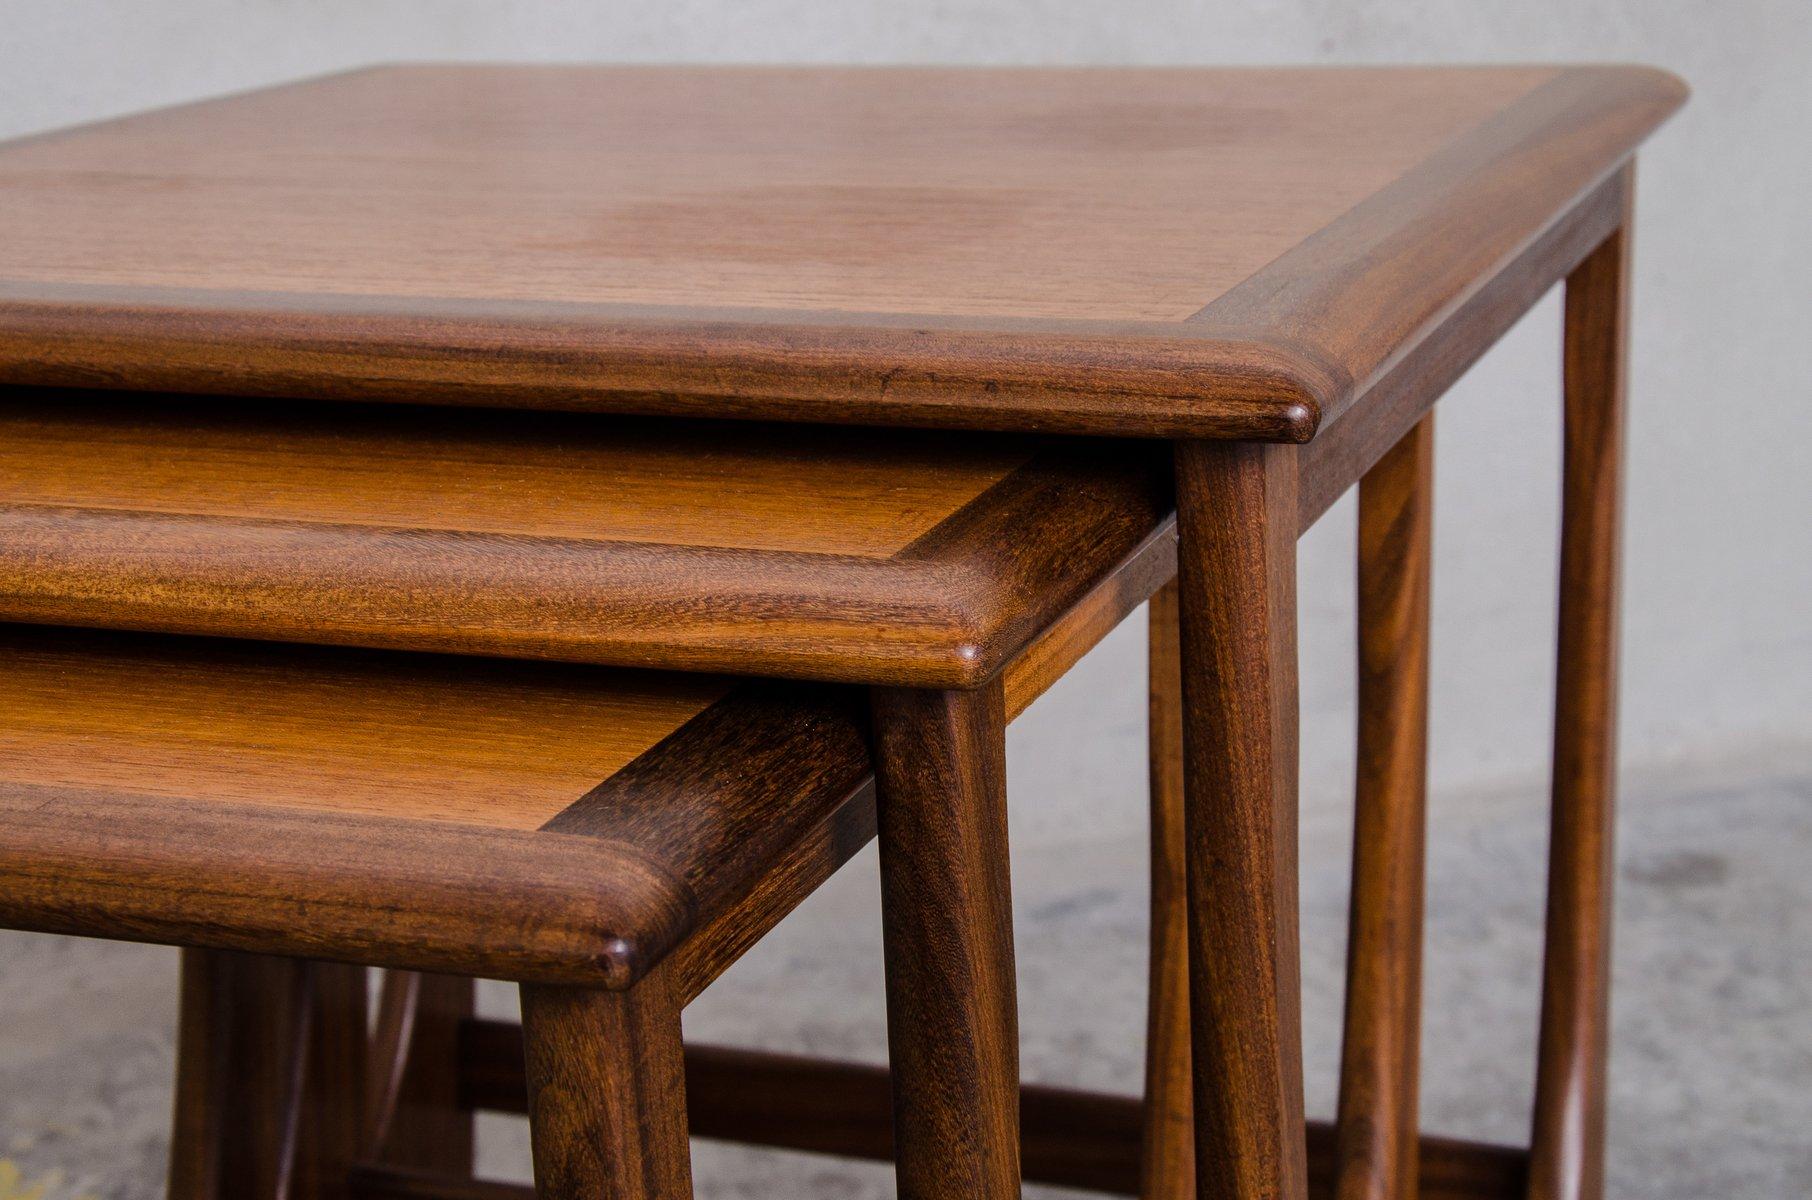 astro nesting tables by kai kristiansen for gplan s for sale  - astro nesting tables by kai kristiansen for gplan s